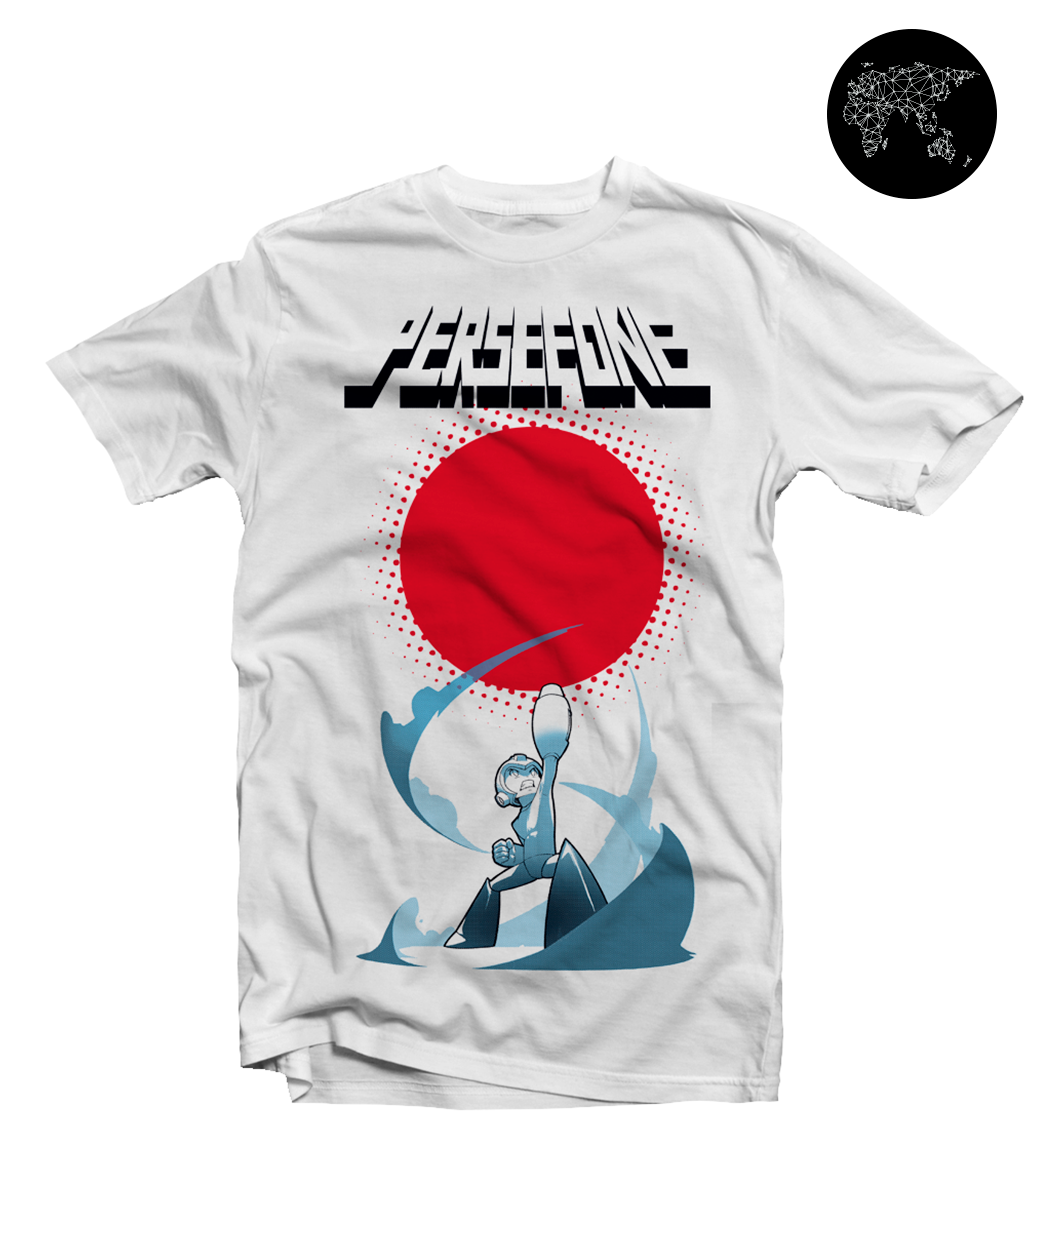 Persefone - Megaman T-shirt